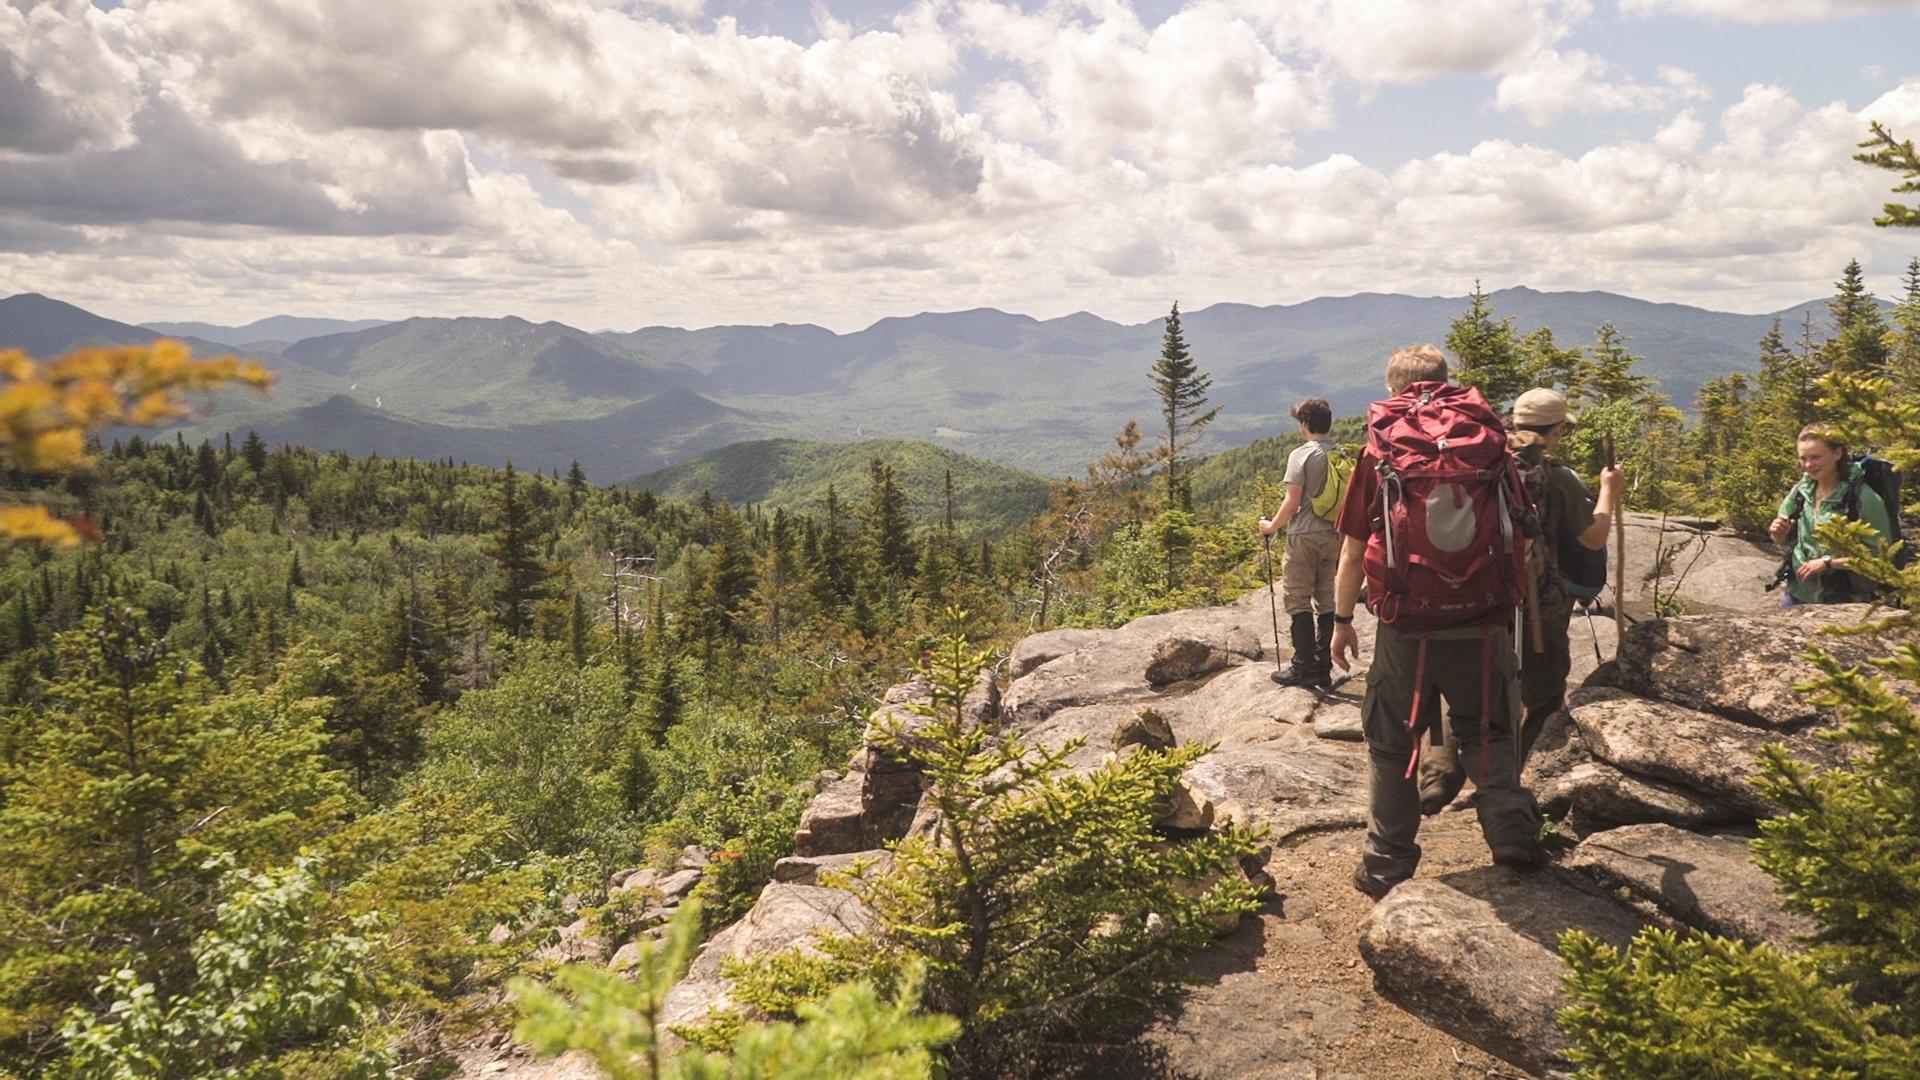 Summer Program - Kayaking | National Outdoor Leadership School (NOLS) Summer Programs for Teens